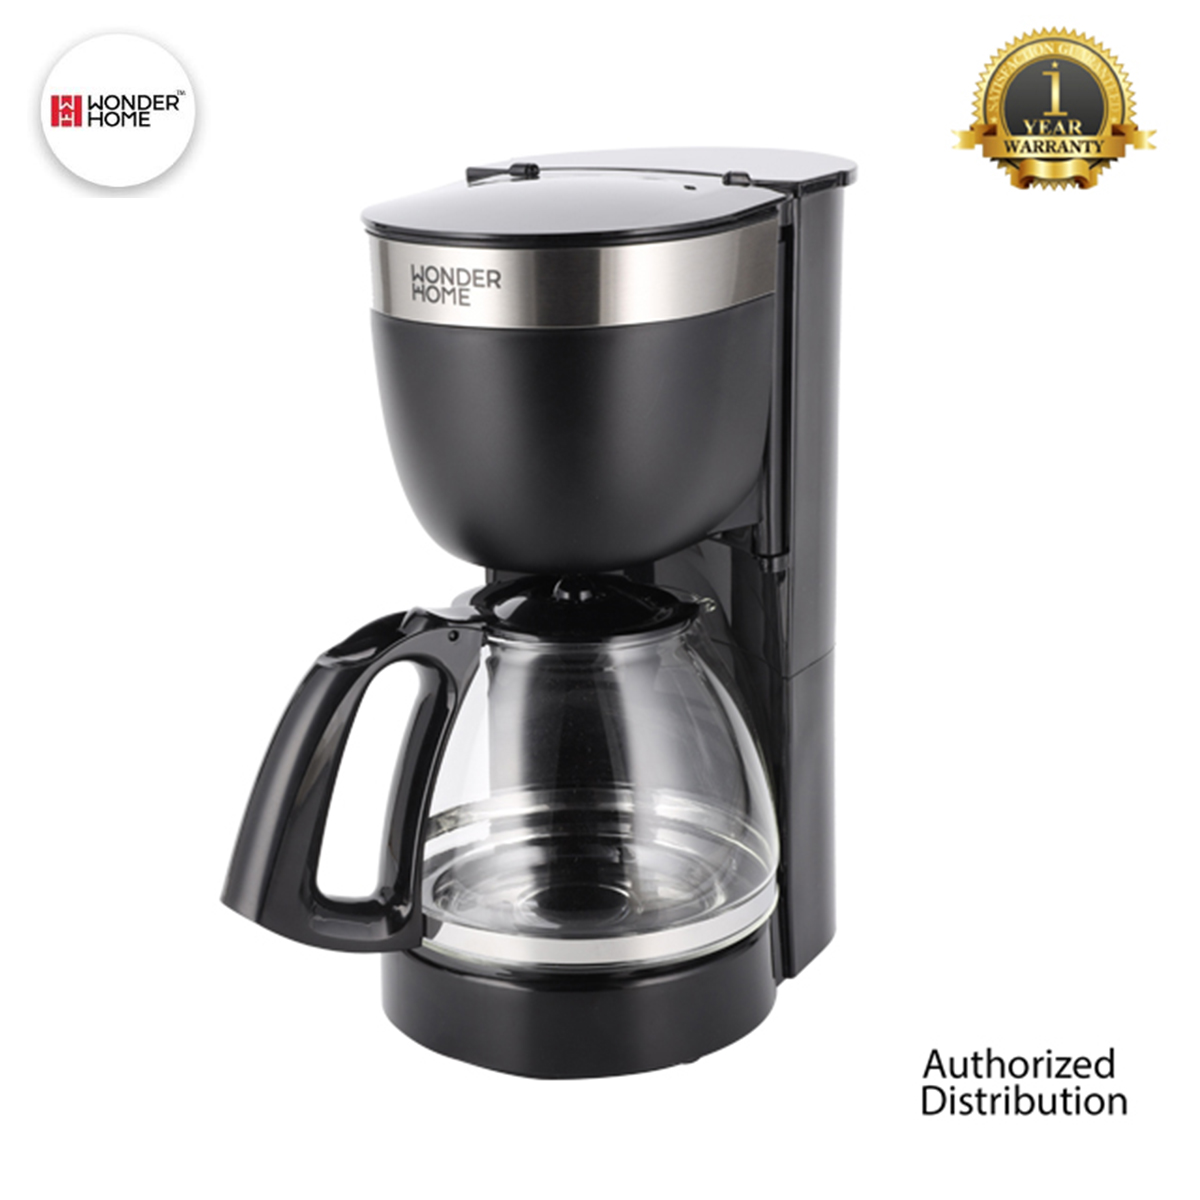 WONDER HOME Filter Drip Coffee Maker 1.25 Liter (WH-CM-125L)